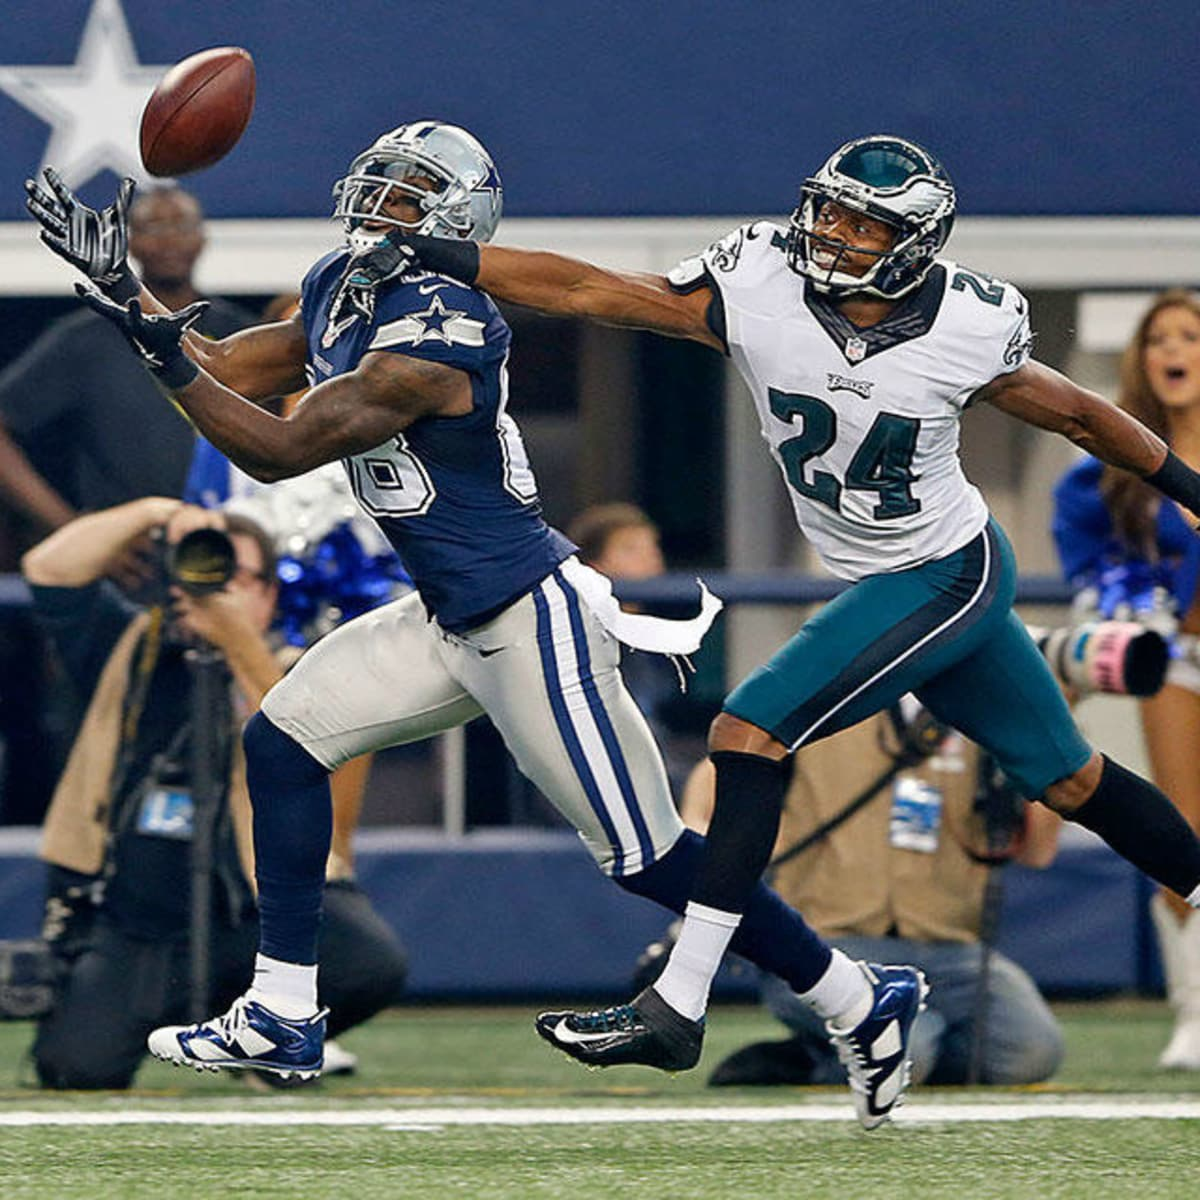 Dez Bryant of the Dallas Cowboys